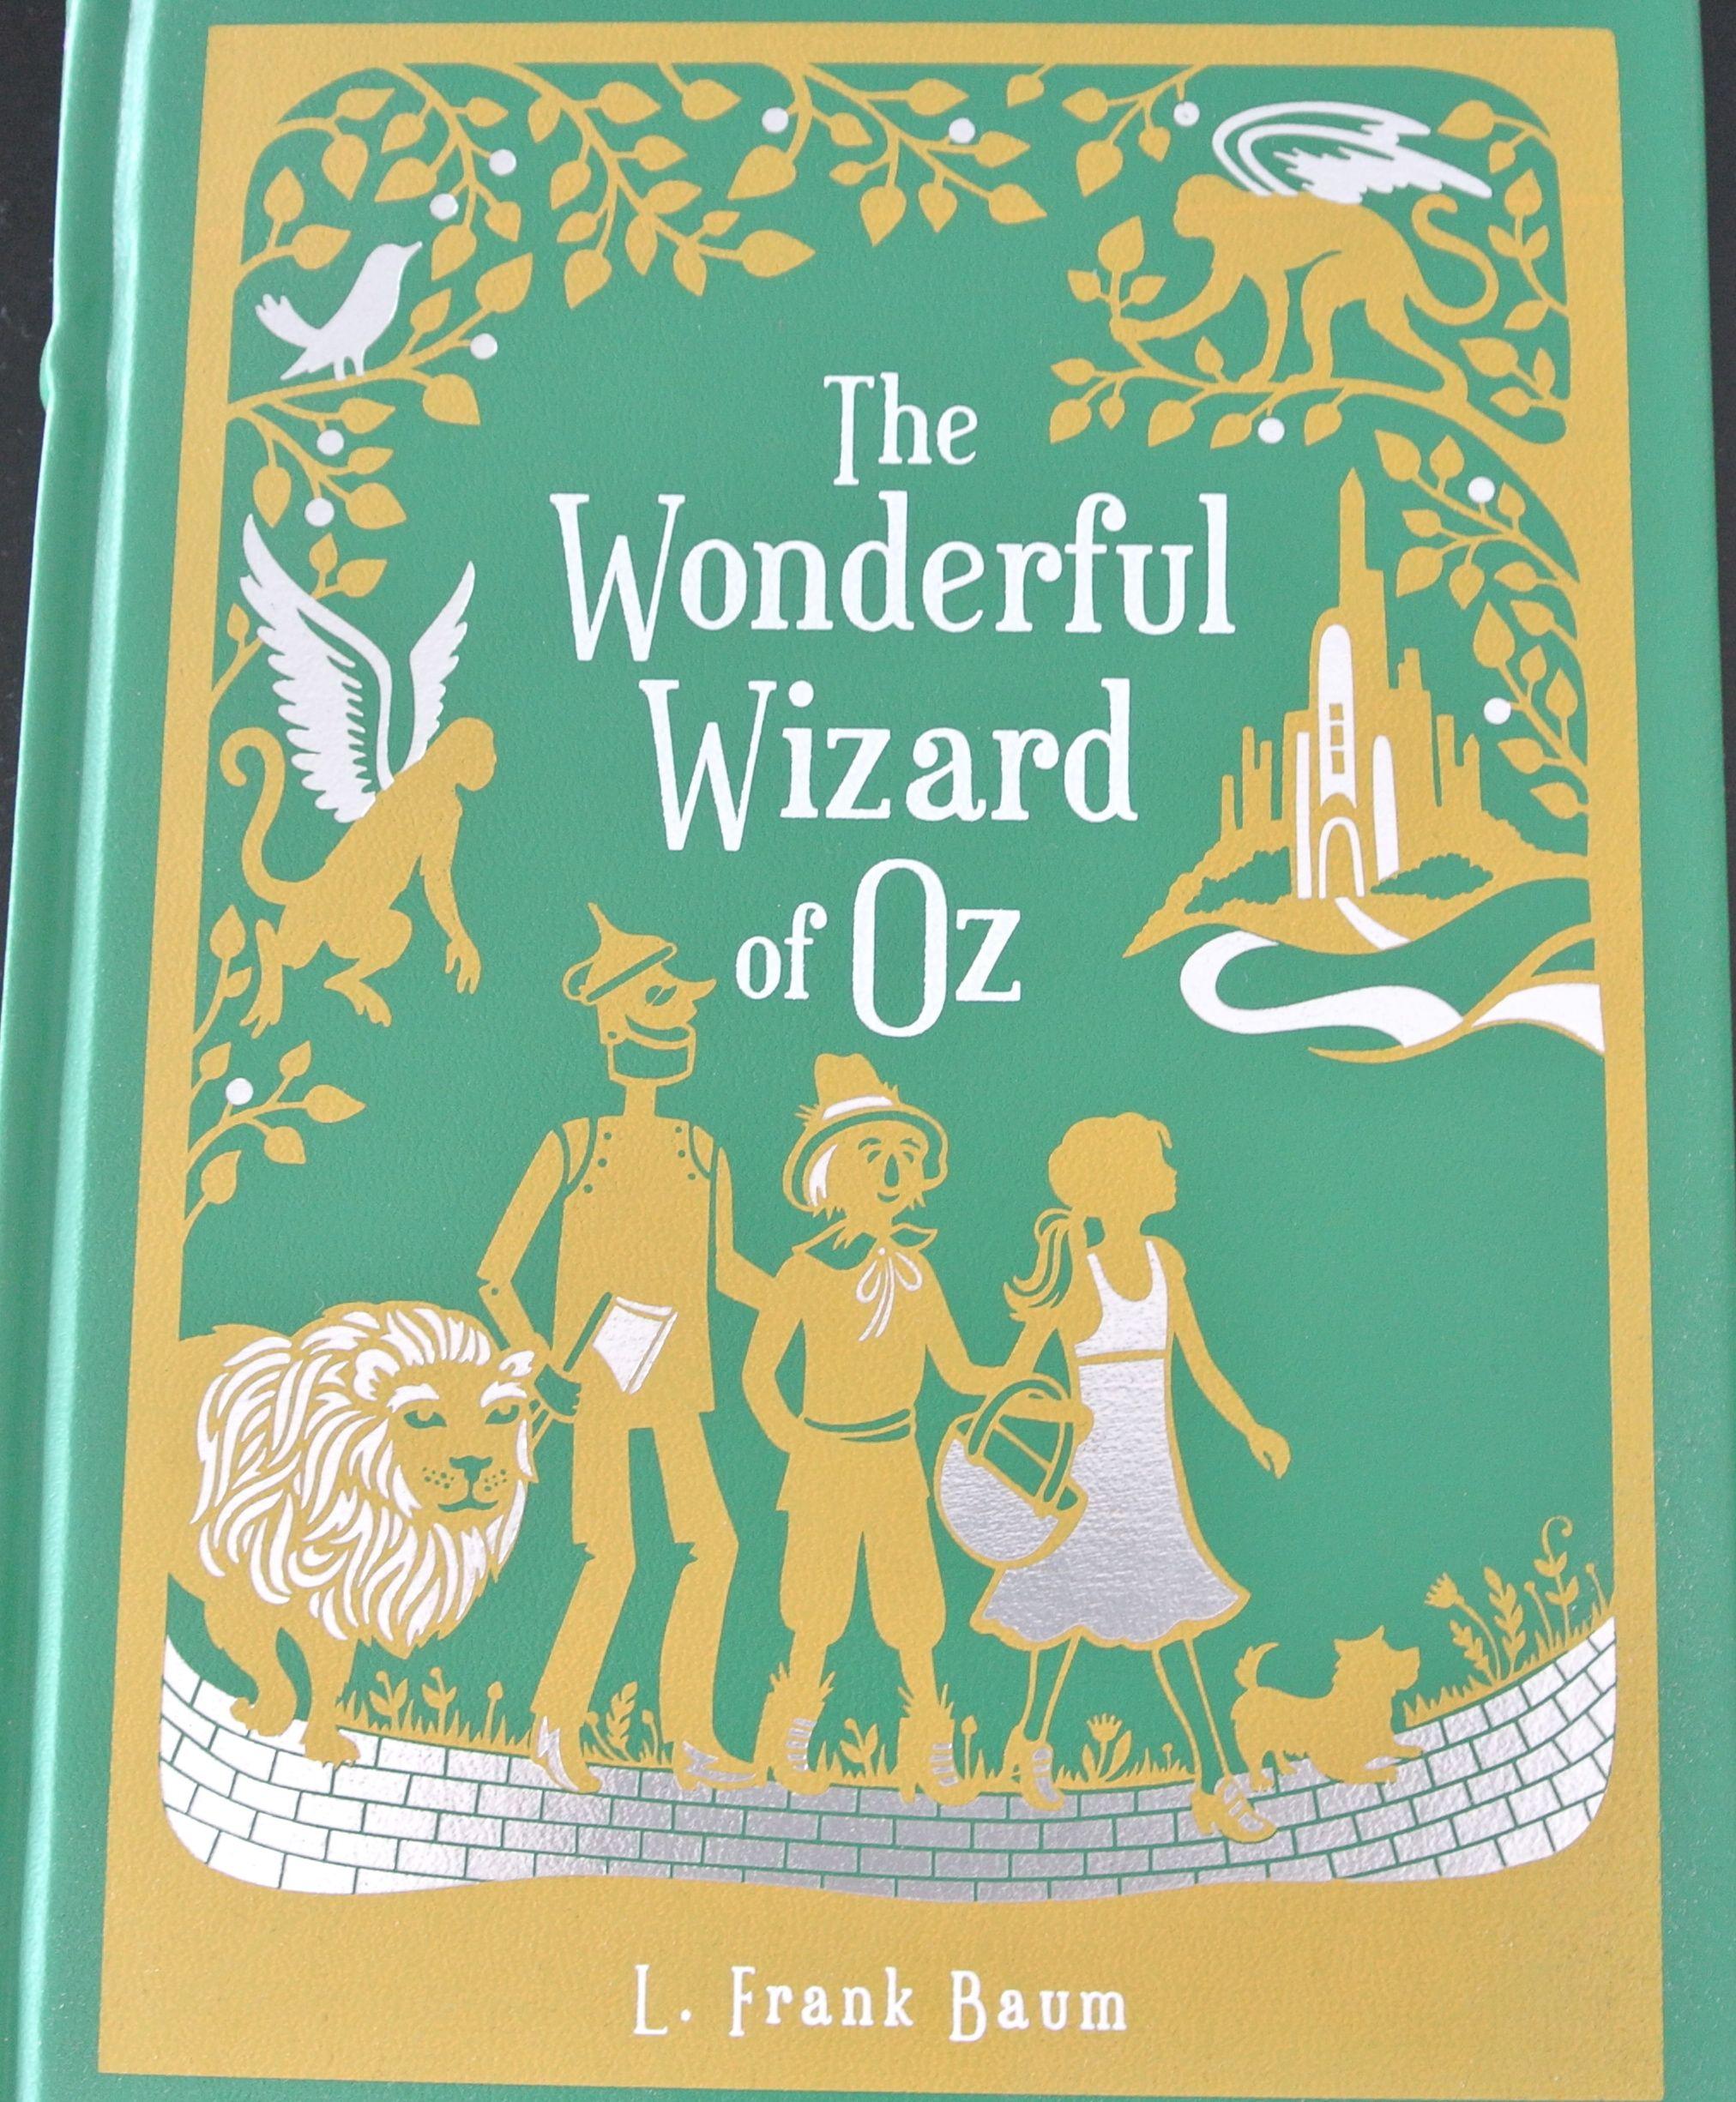 The Wonderful Wizard Of Oz By L Frank Baum Quotes The Wonderful Wizard Of Oz Wizard Of Oz Book Wizard Of Oz